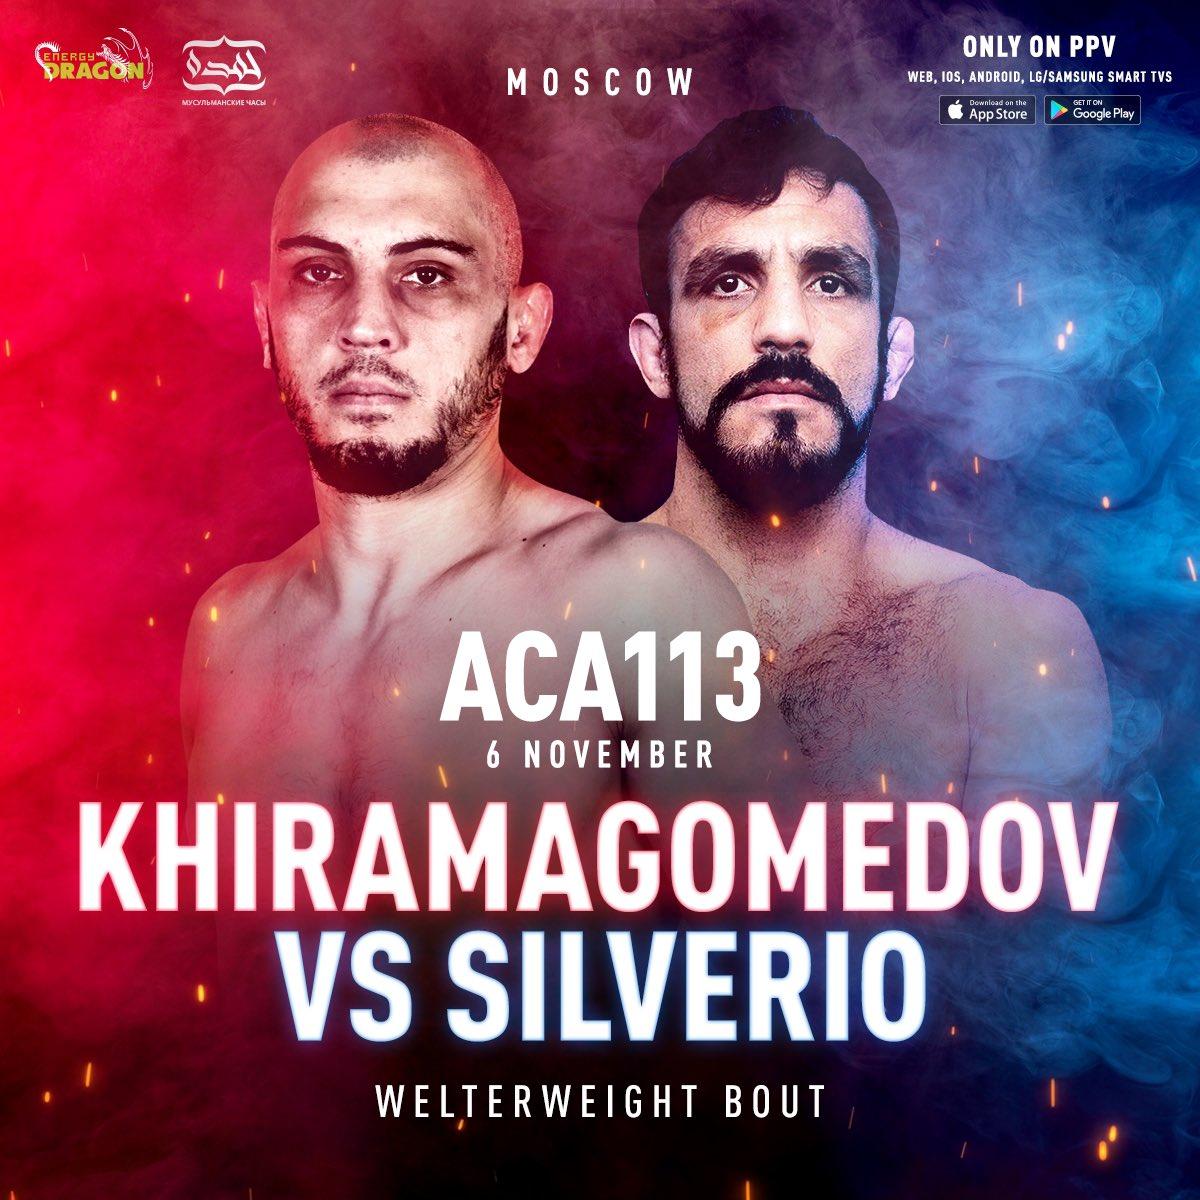 ⚡️Welterweight fight at ACA 113!   Gadzhimurad Khiromagomedov (8-4) vs. Elias Silvério (17-4) https://t.co/CJk5WHtvPI